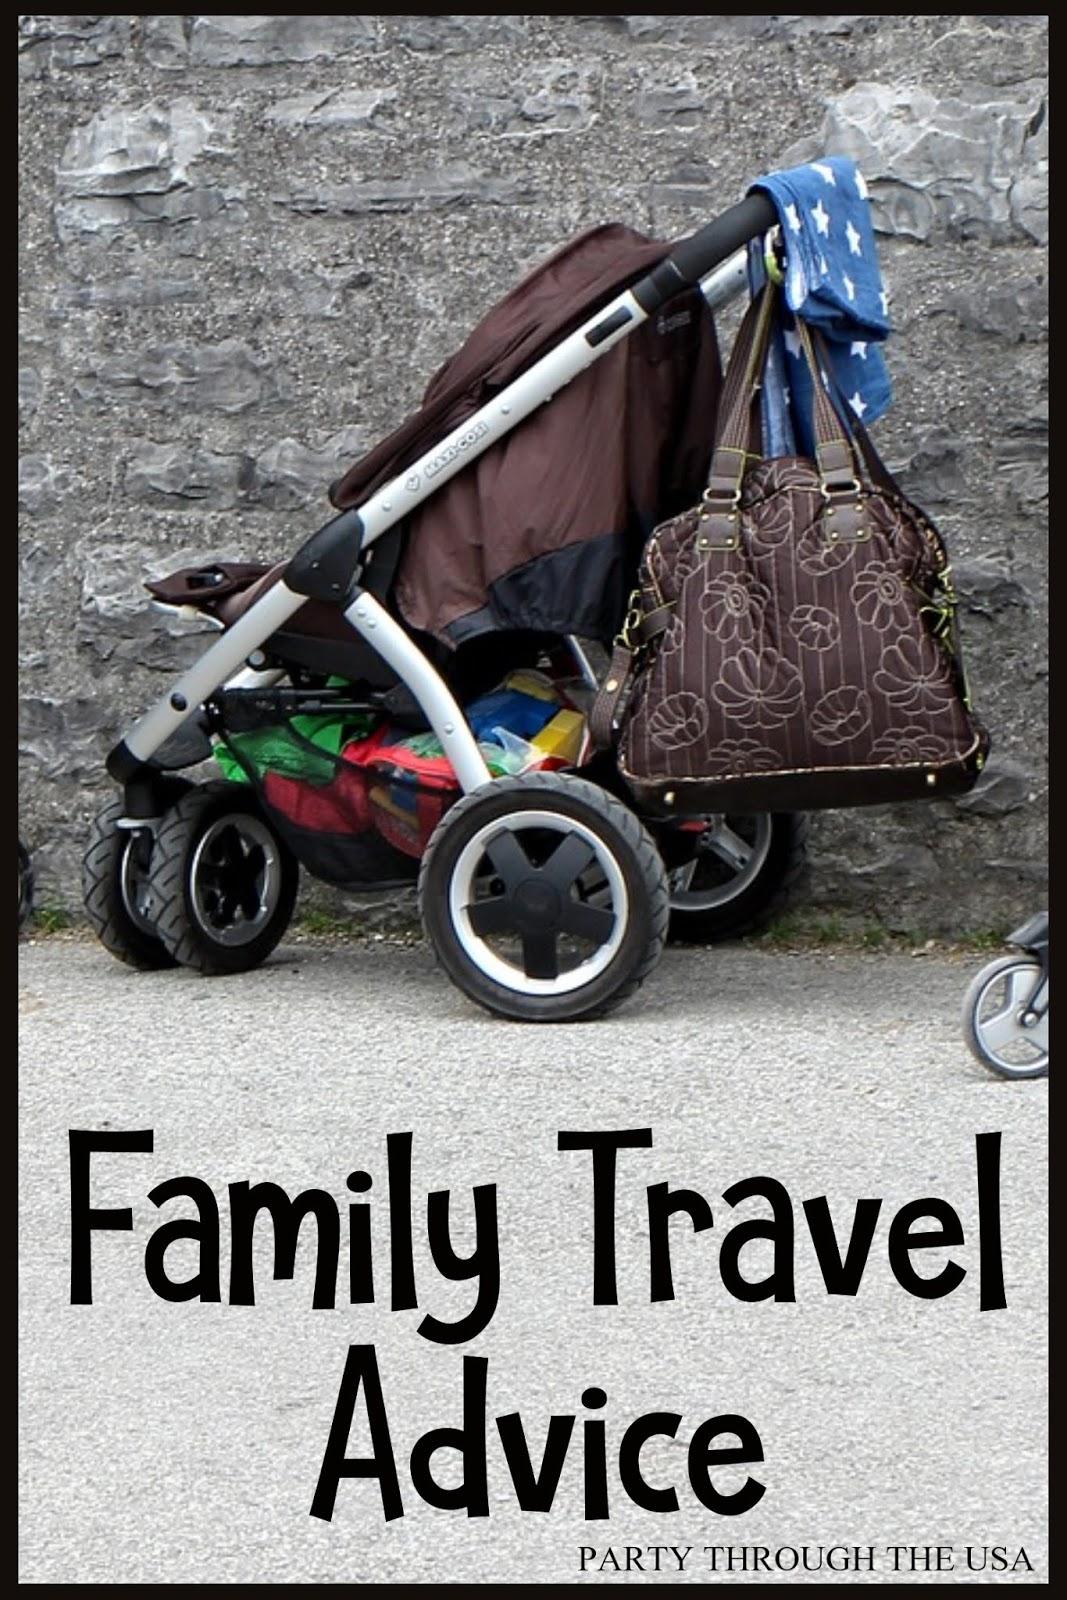 Usa Travel Advice >> Party Through The Usa Travel Advice